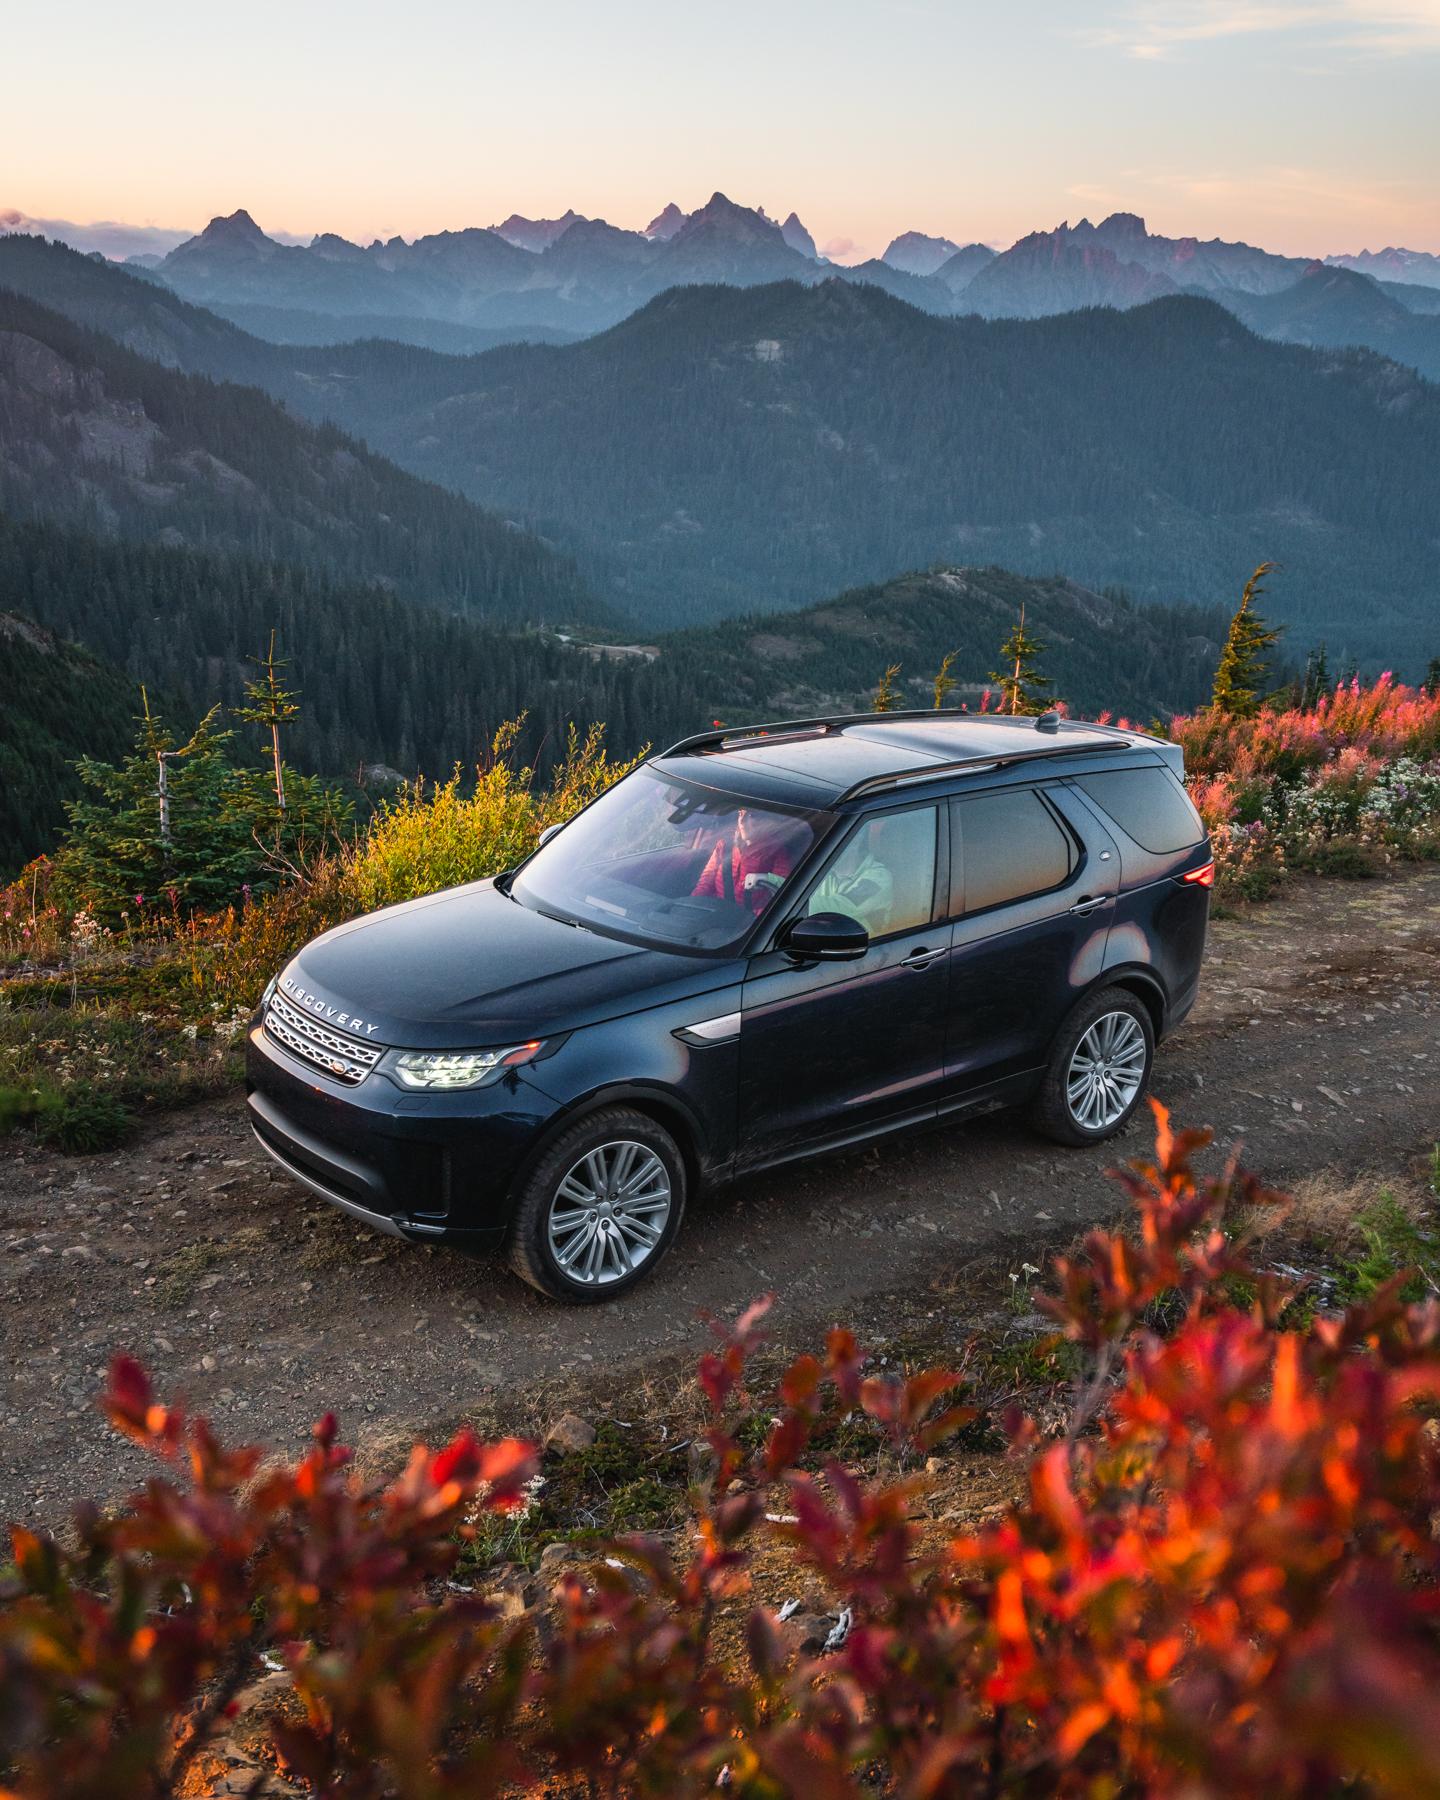 Range Rover Usa >> Land Rover Cascades Scott Kranz Photography